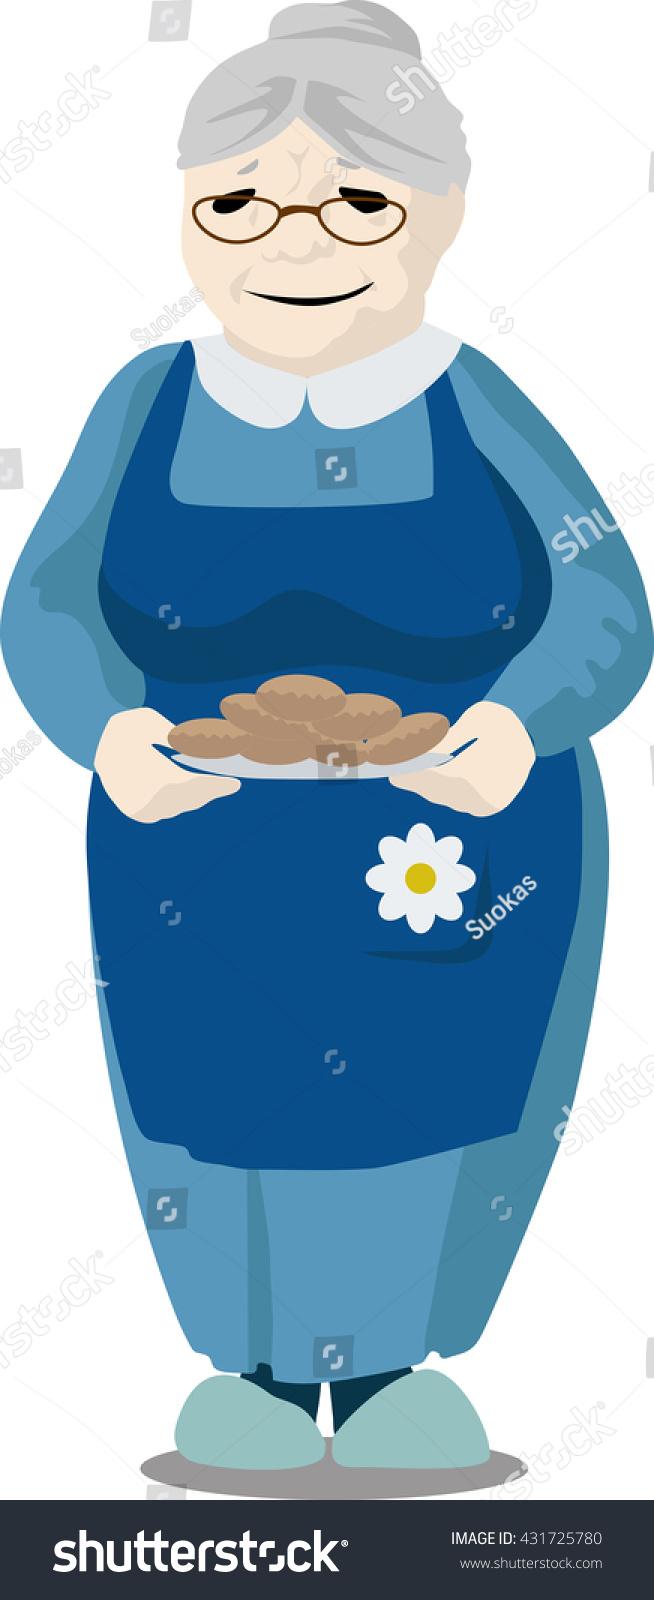 sc 1 st  Shutterstock & Grandmother Holding Plate Pies Stock Vector 431725780 - Shutterstock